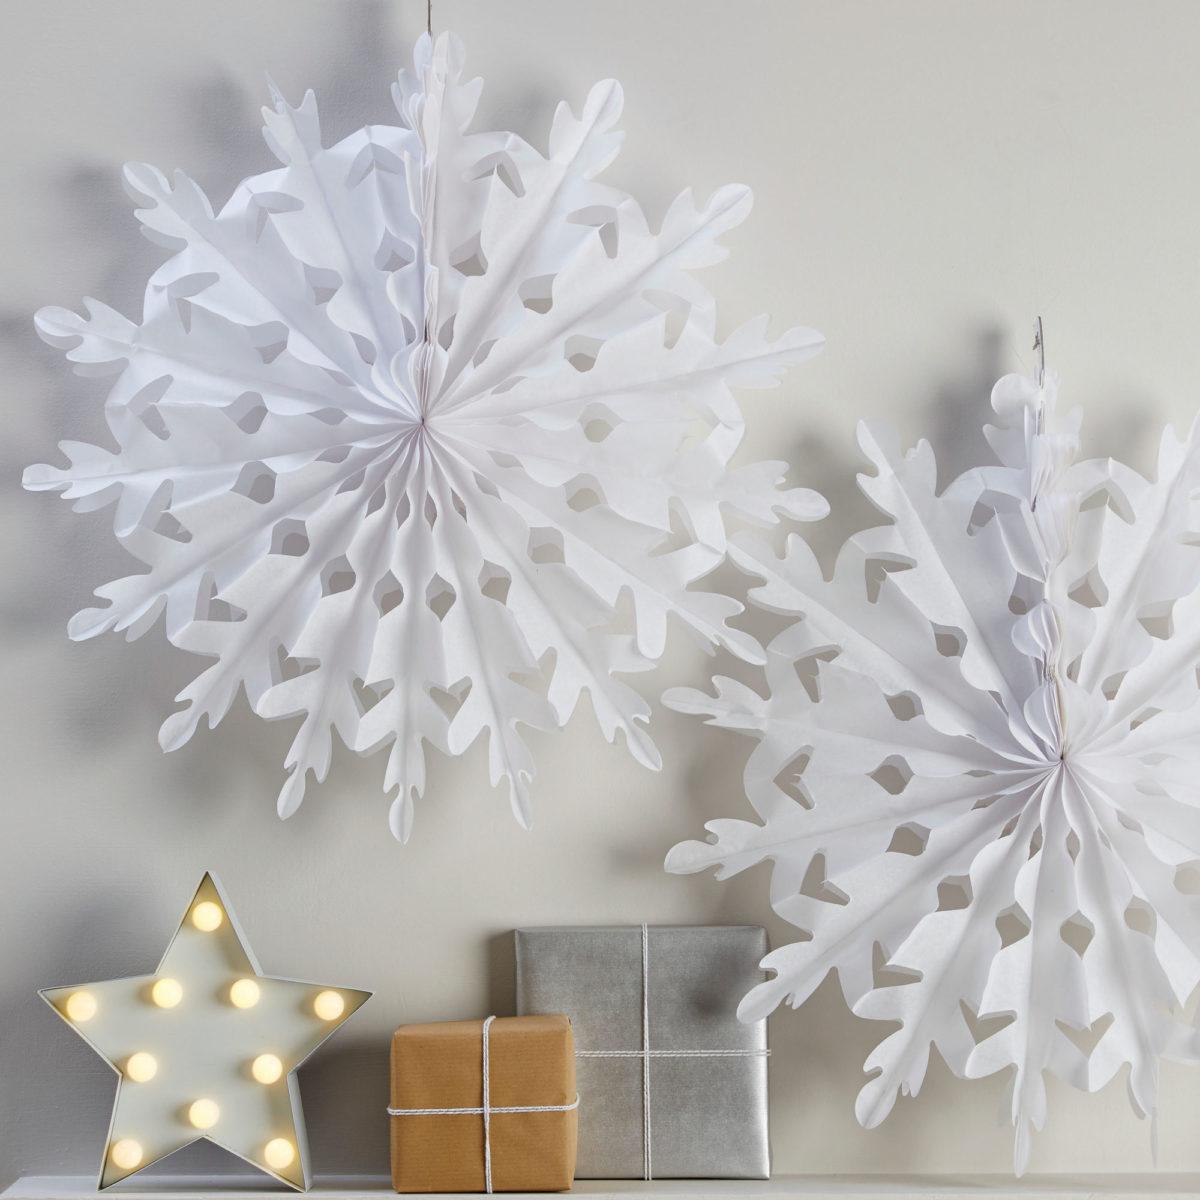 17ginger-ray_festive-white-giant-hanging-snowflakes-christmas-metallics-1200x1200.jpg